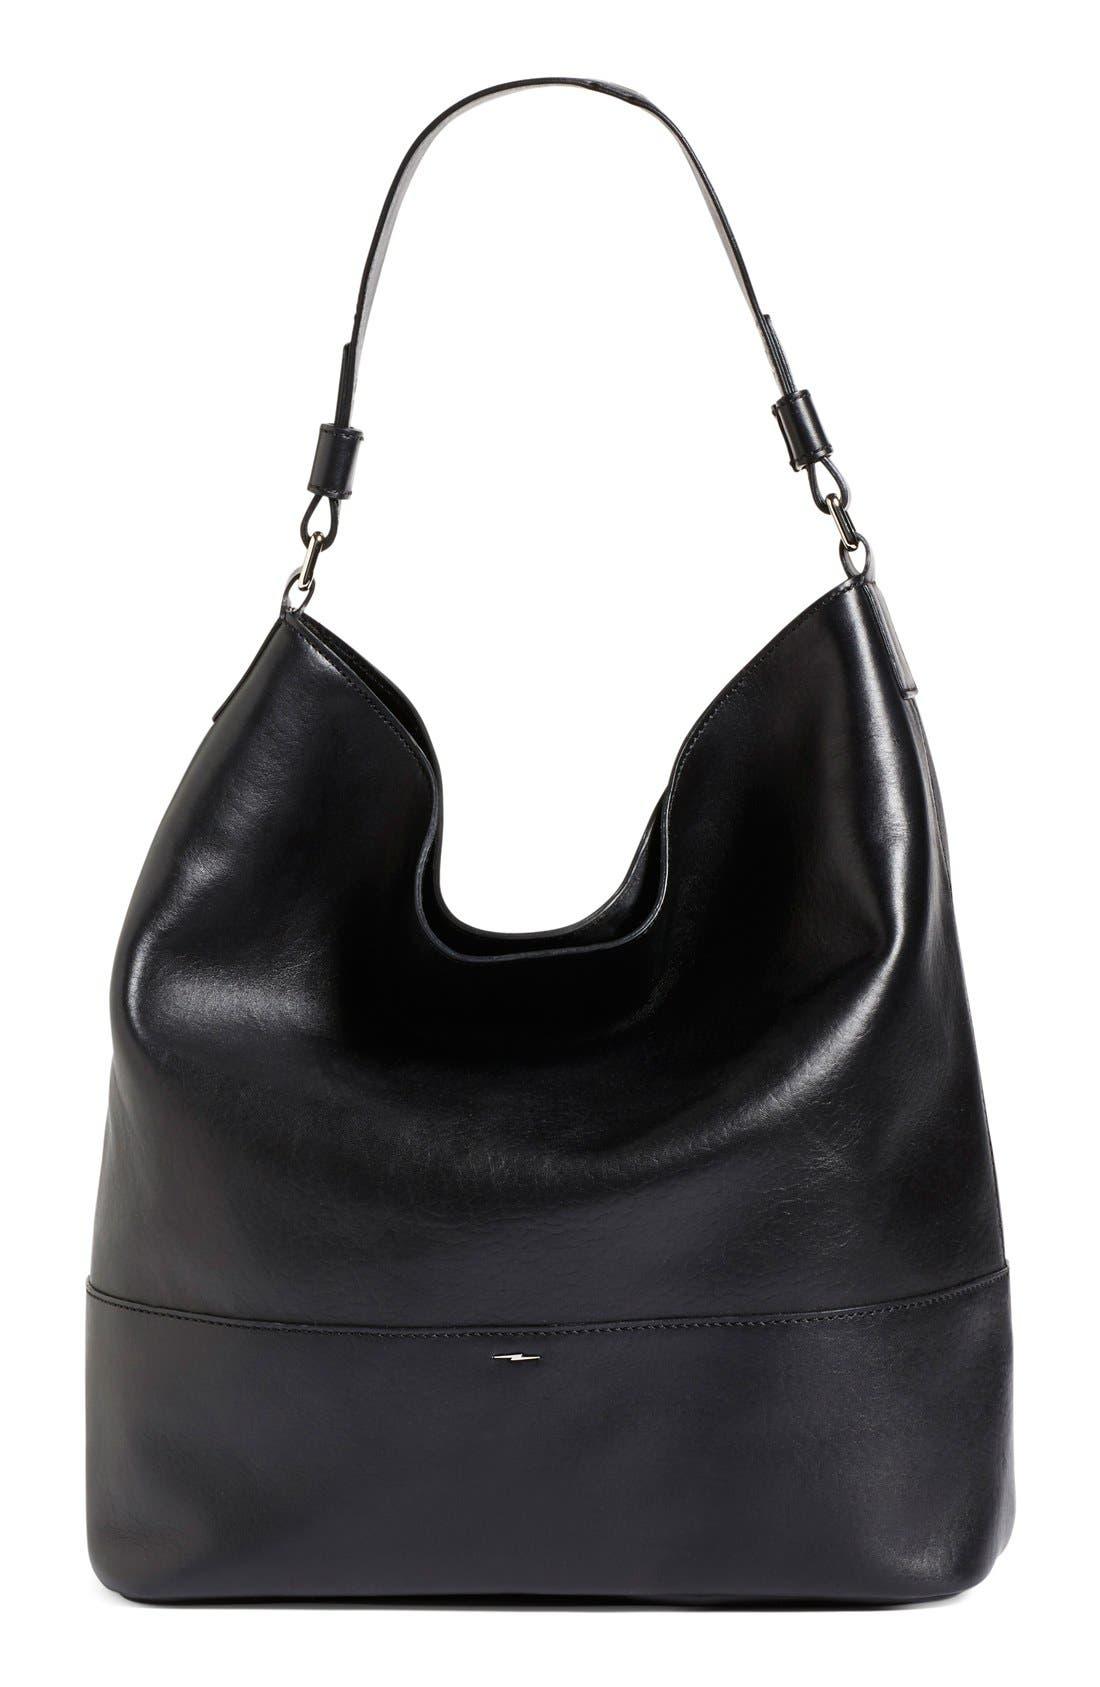 Main Image - Shinola Relaxed Leather Hobo Bag